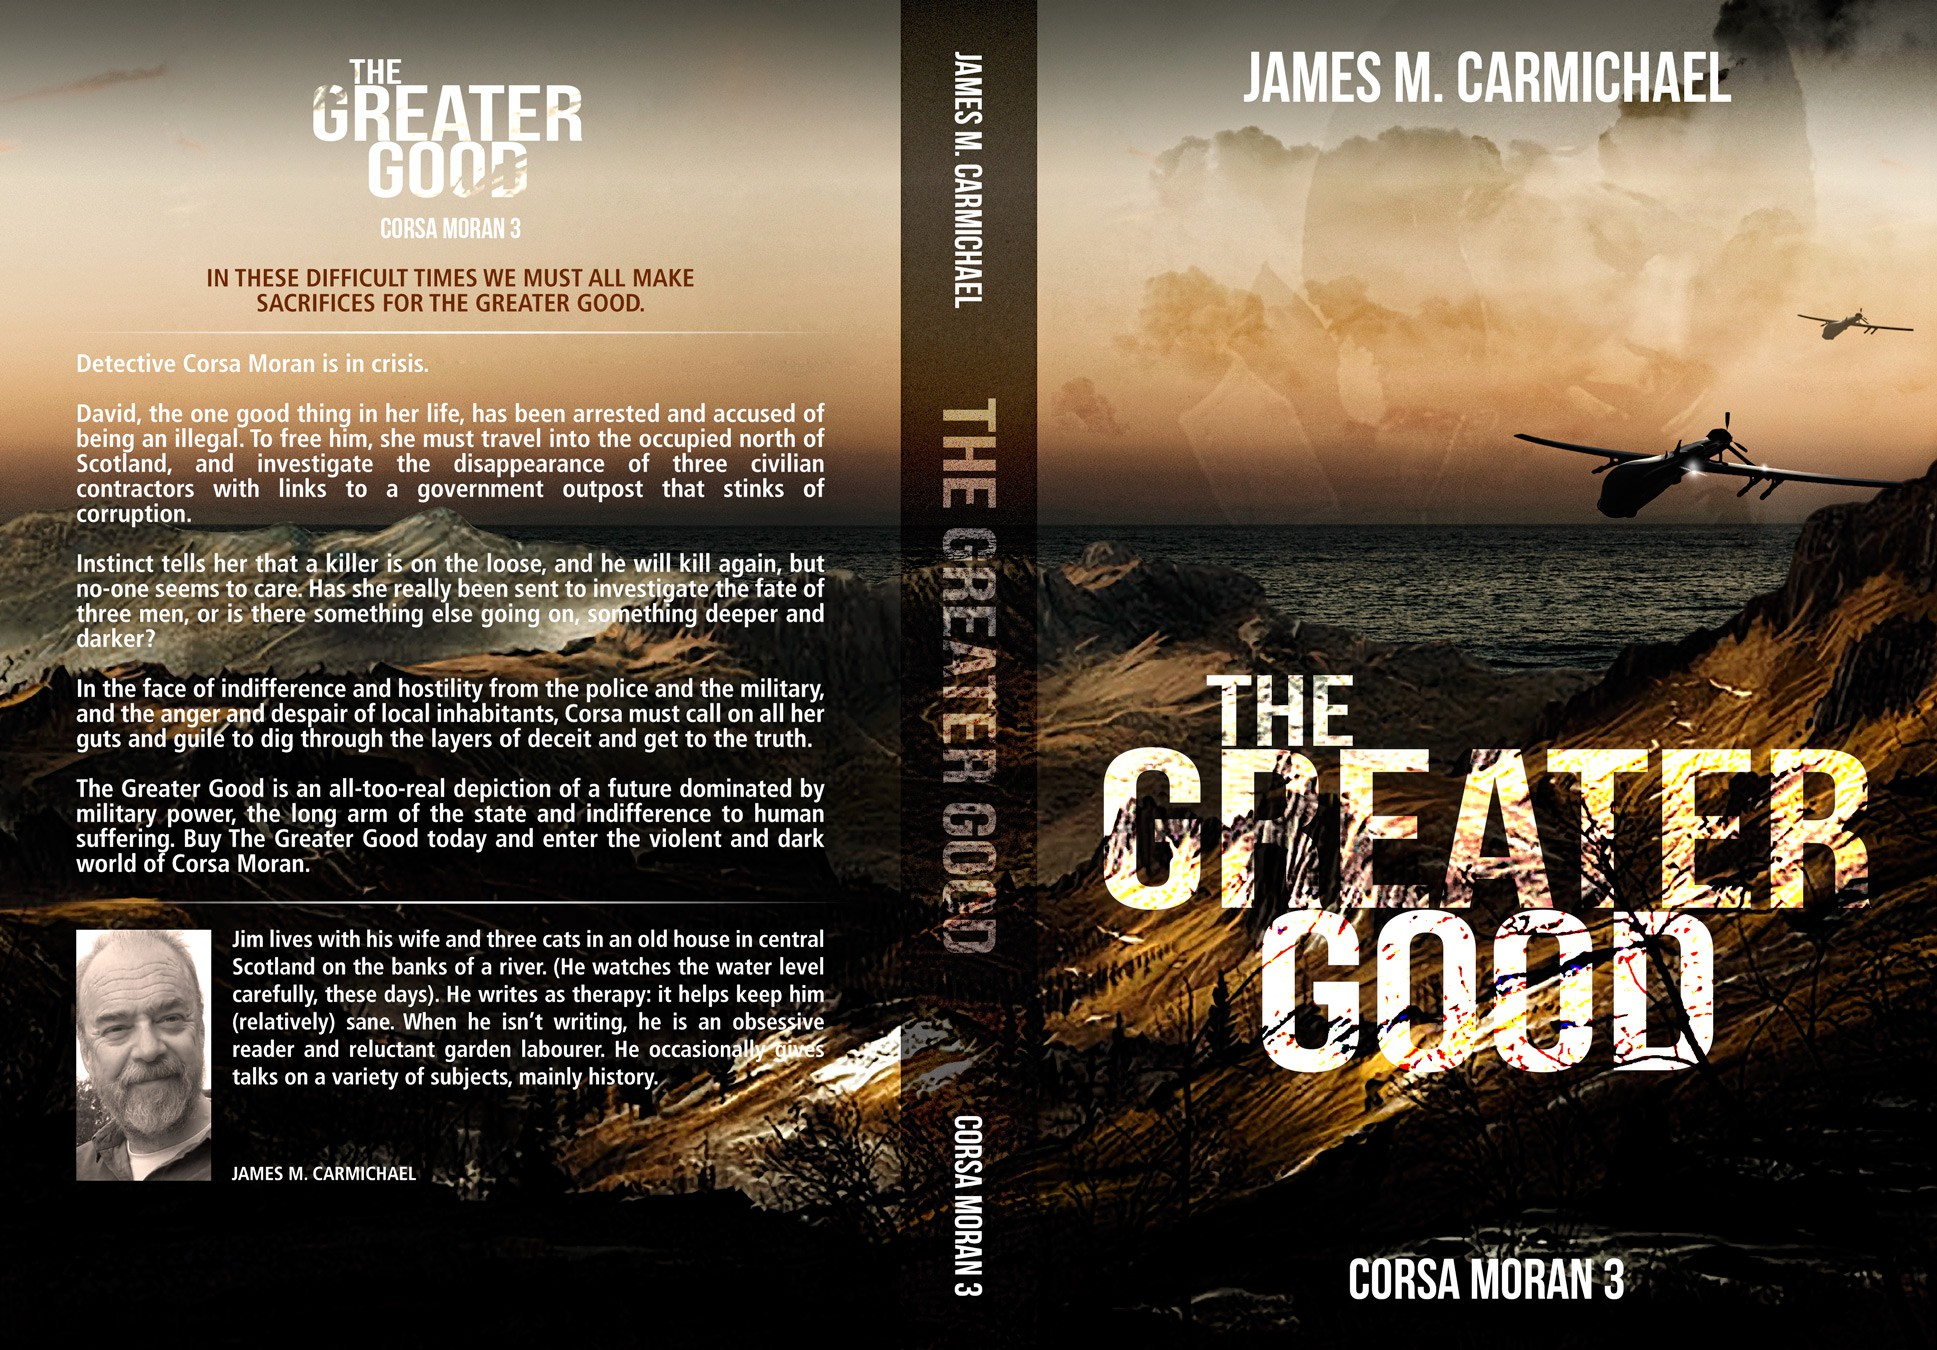 The Greater Good - Corsa Moran 3